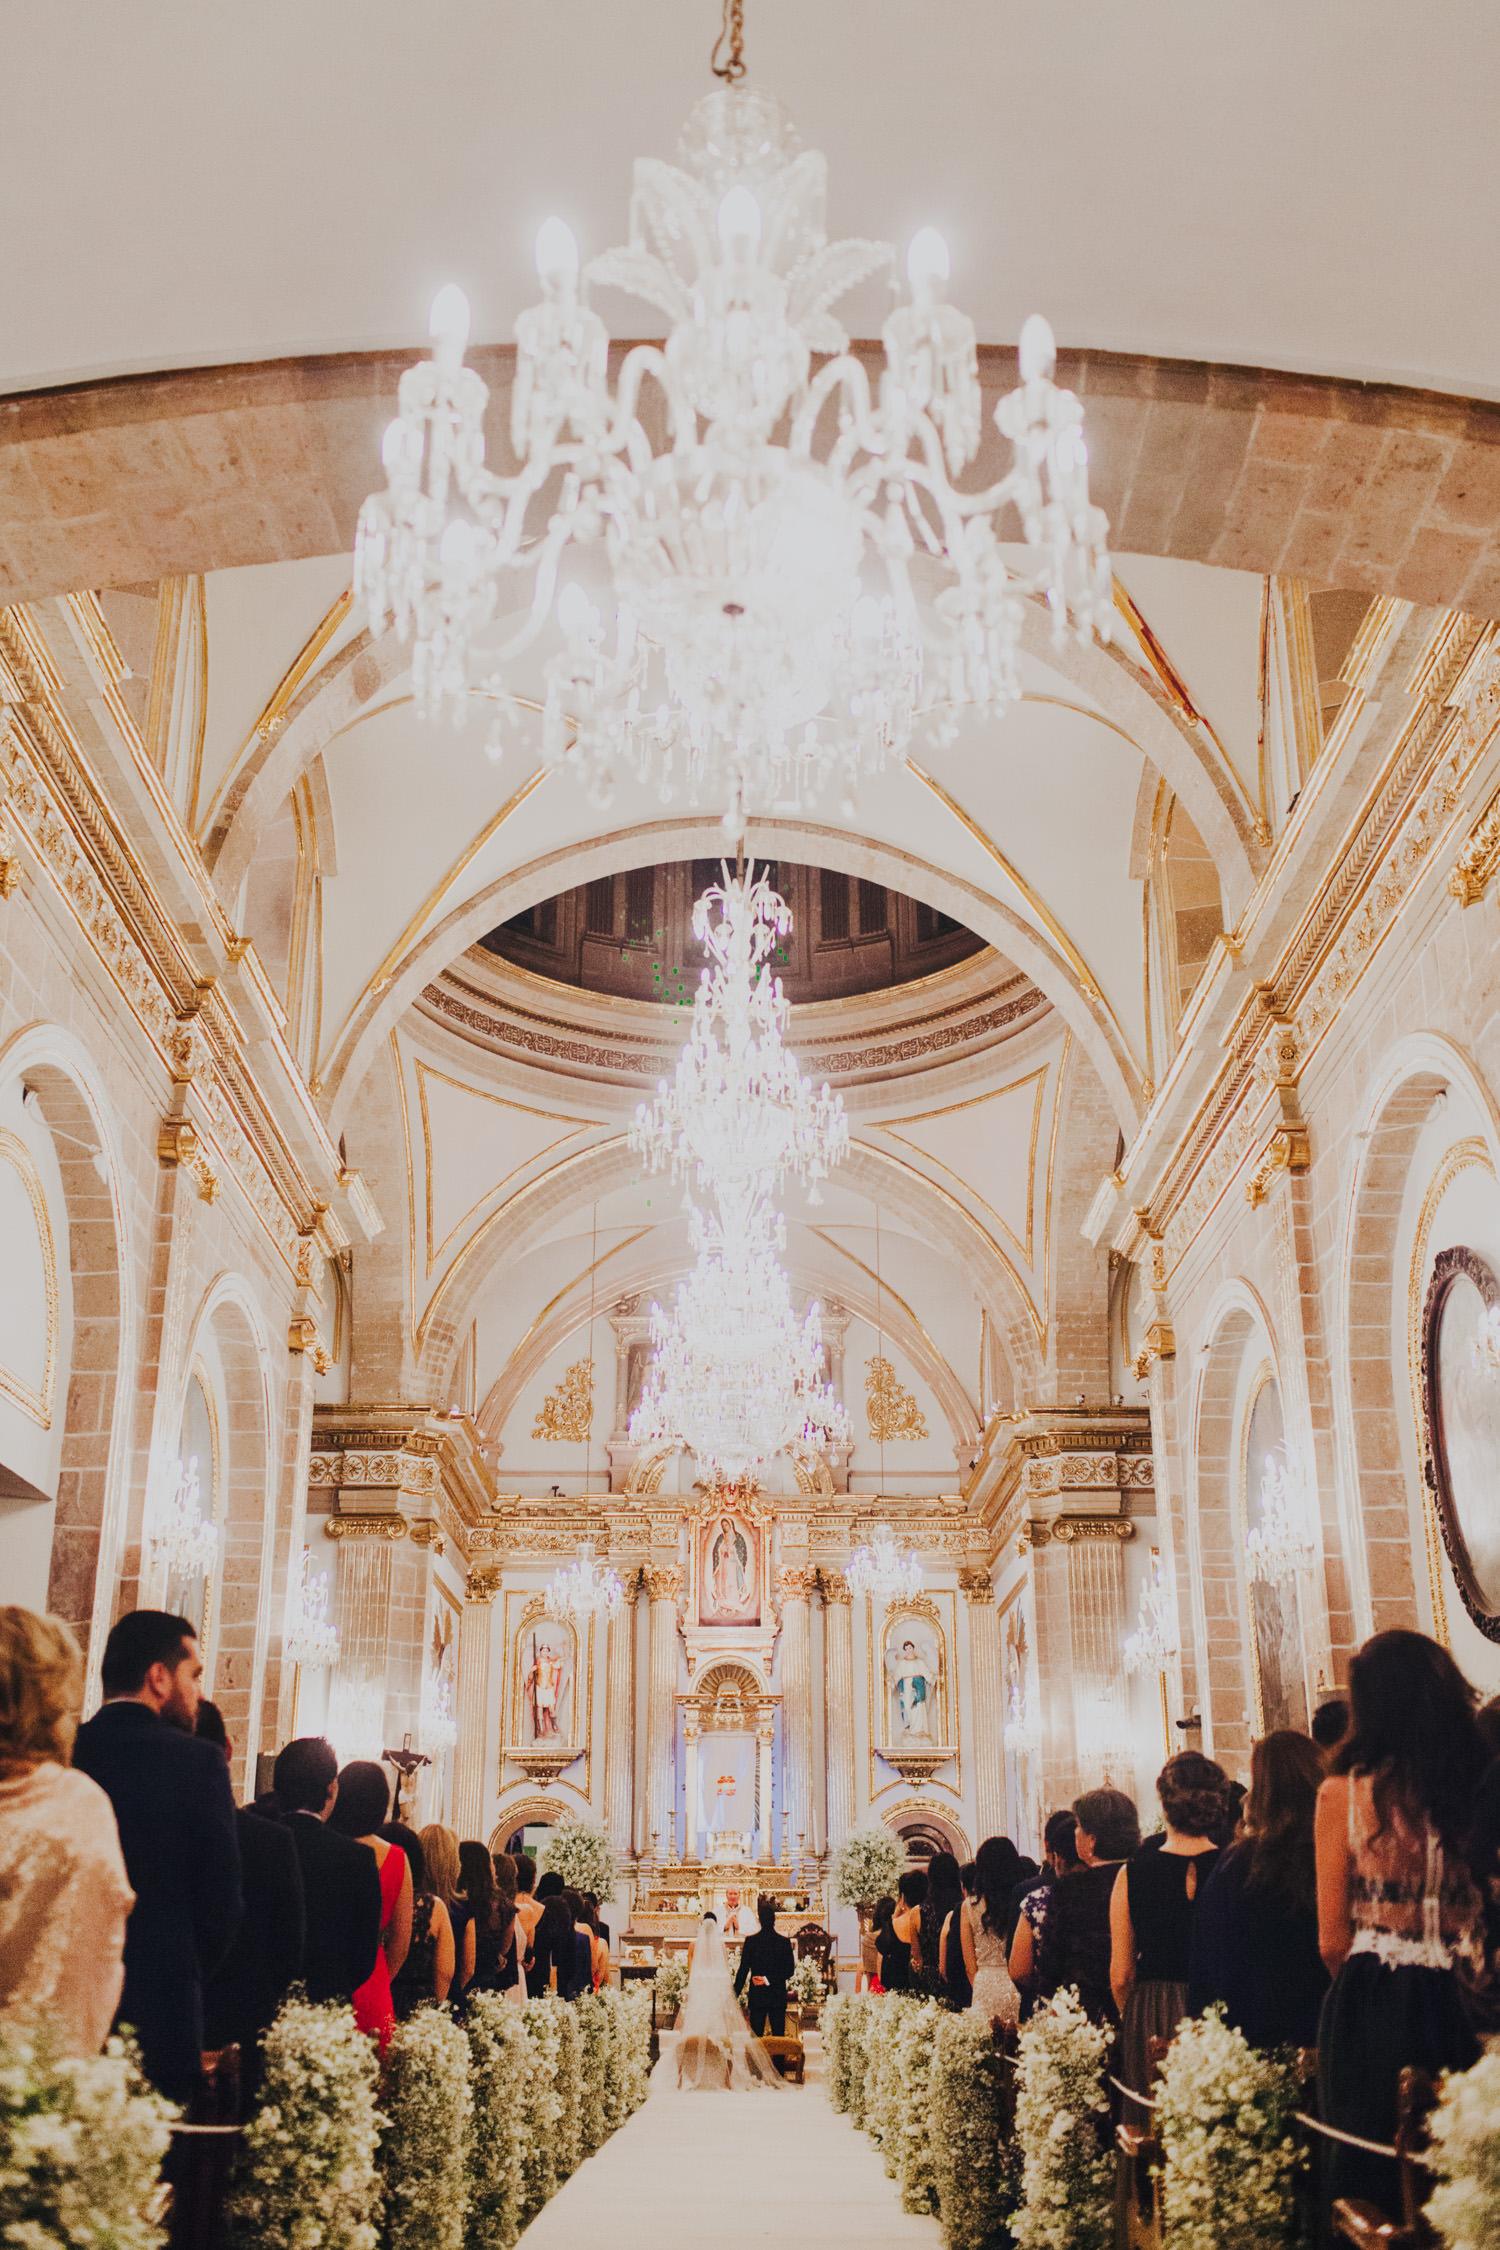 irapuato-boda-fotografia-jardines-alcalde-guanajuato-paulina-juan-pedro--24.jpg